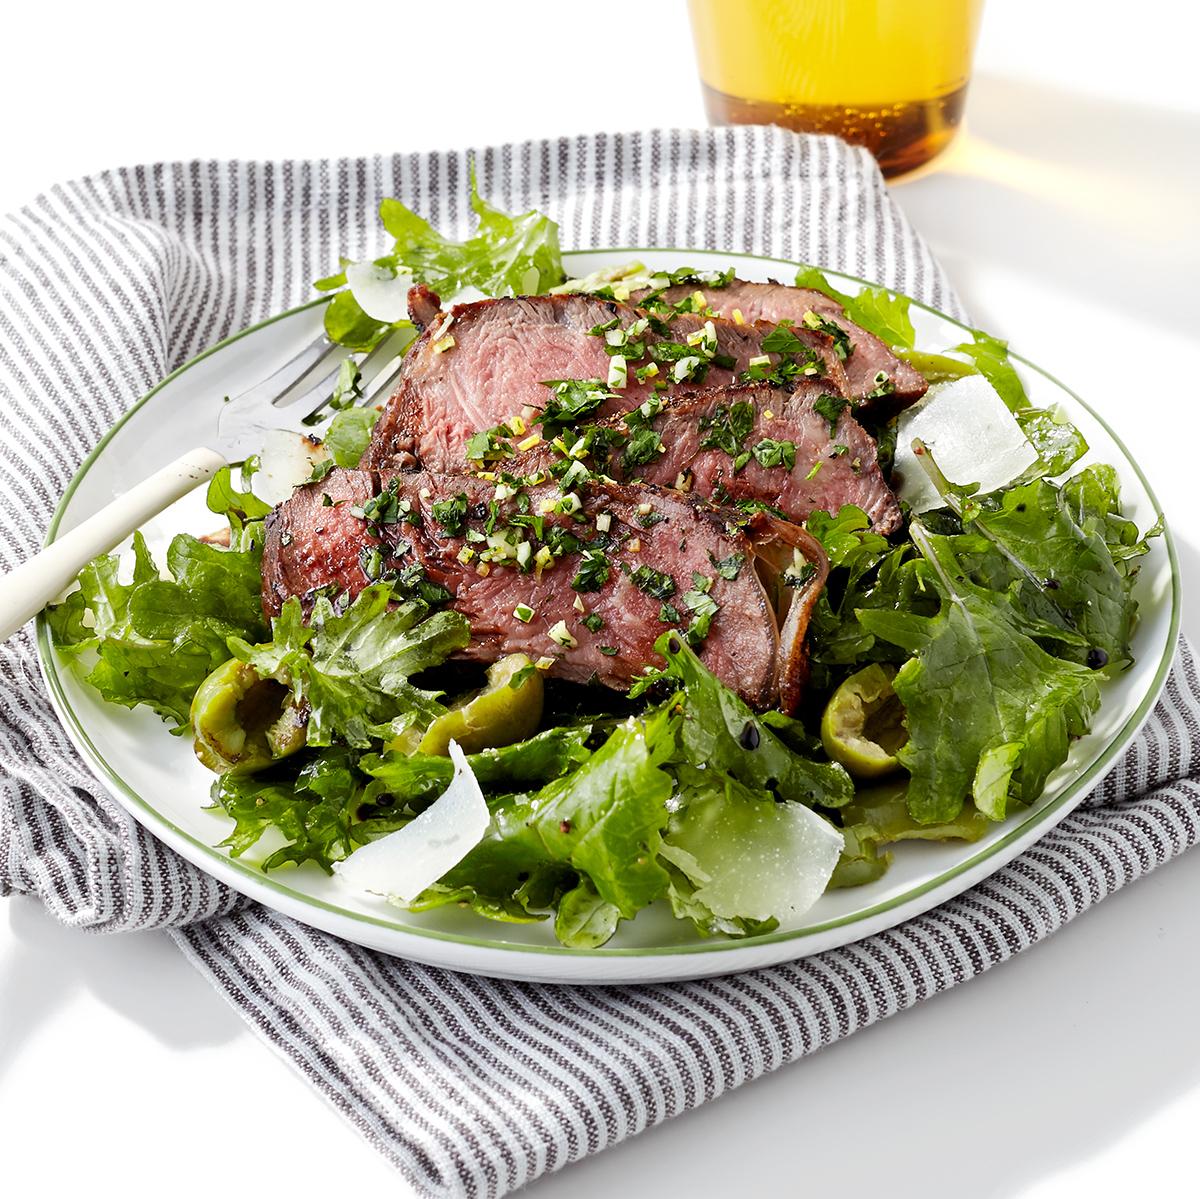 Steak & Kale Salad with Balsamic Vinegar & Parsley Gremolata